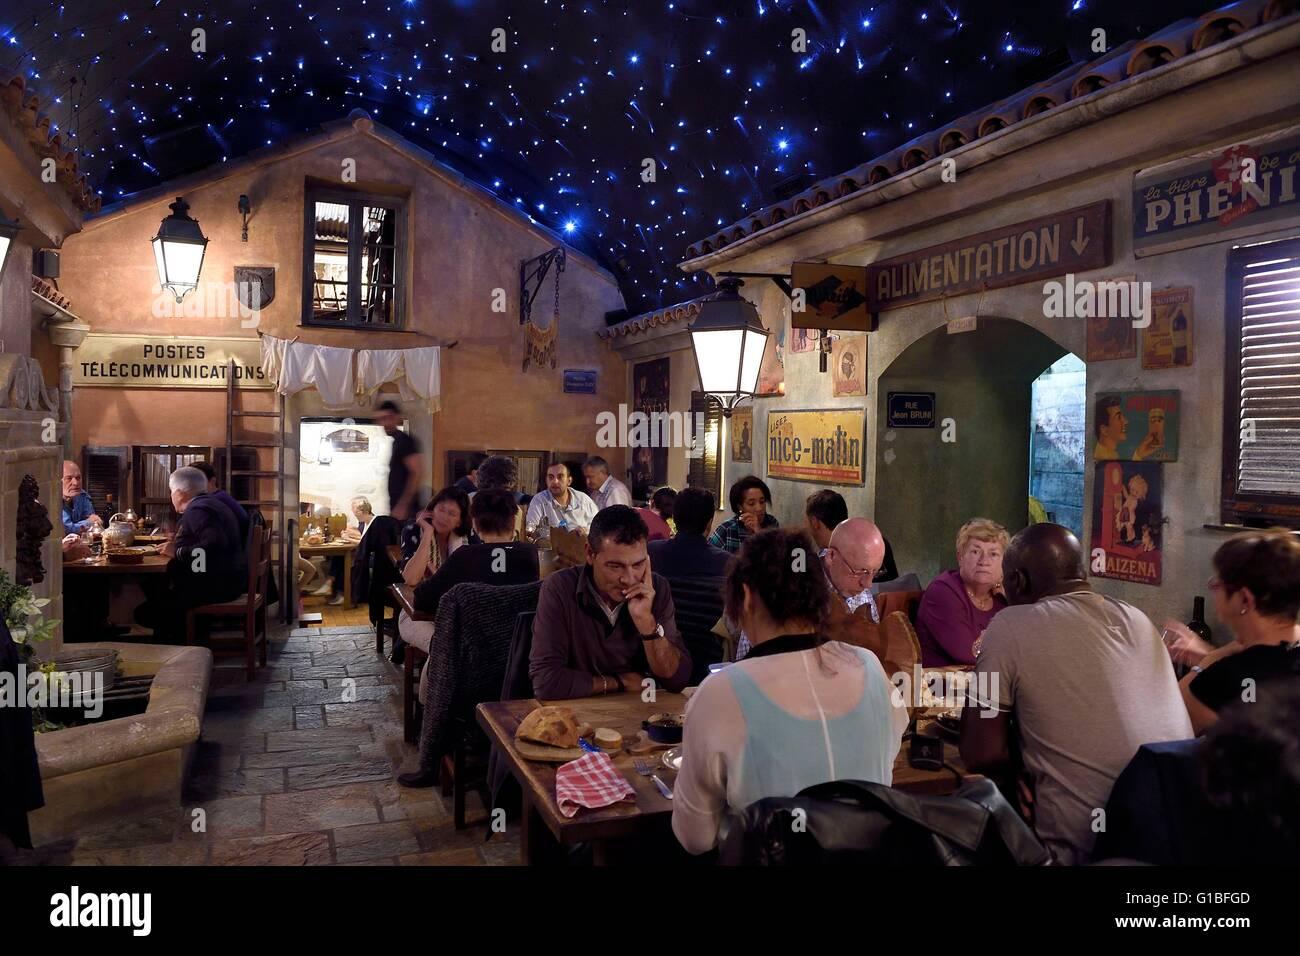 France corse du sud ajaccio restaurant le 20123 in the rue du roi stock photo royalty free - Restaurant corse du sud ...